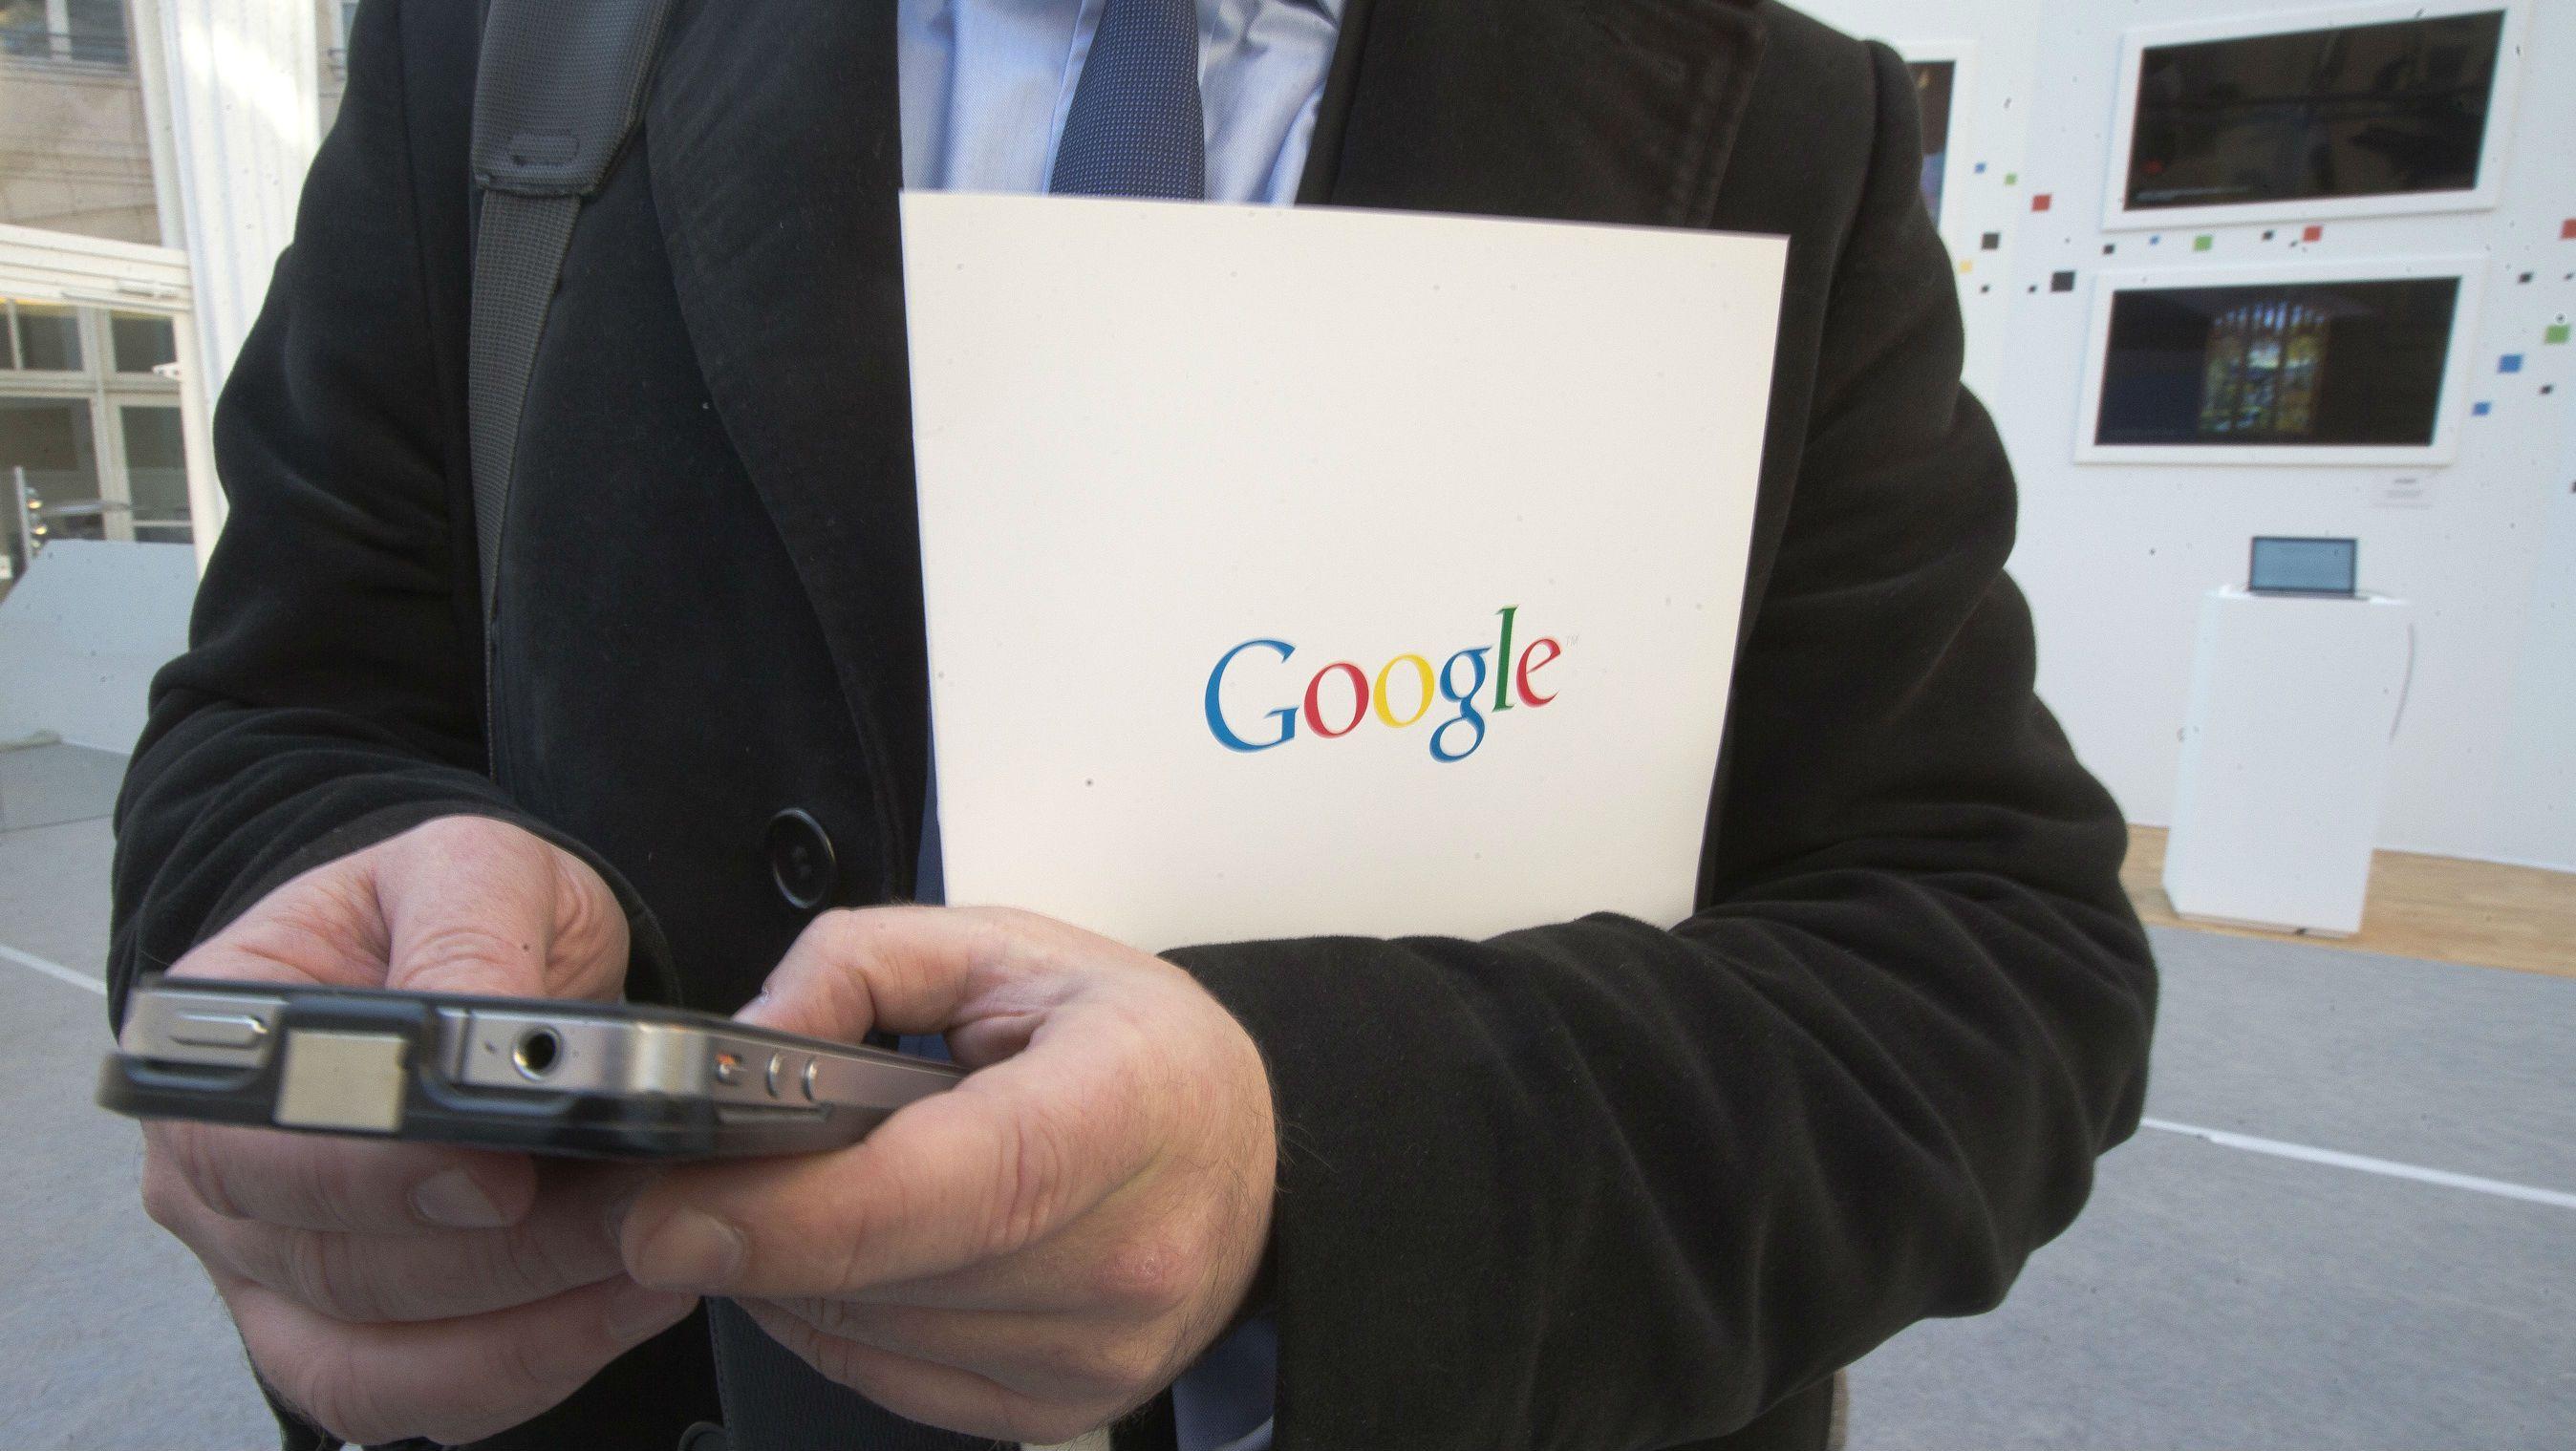 Google wireless service